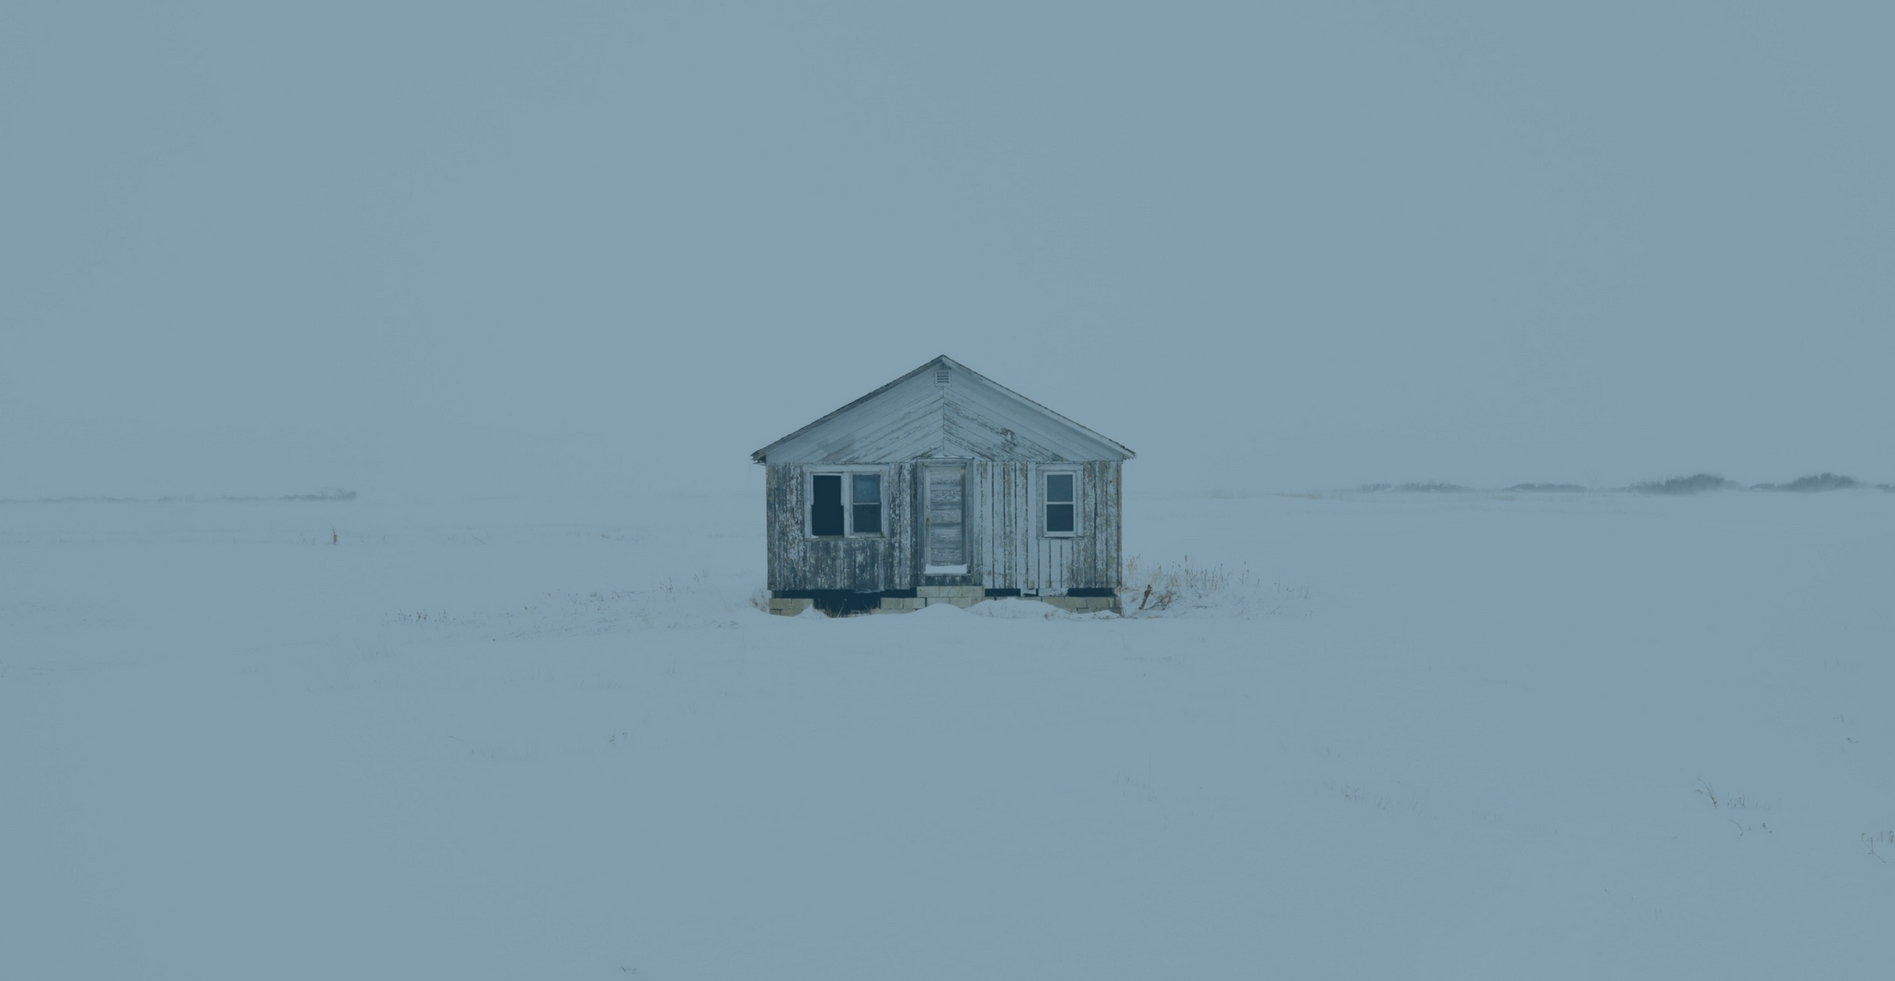 lone cabin winter blue overlay